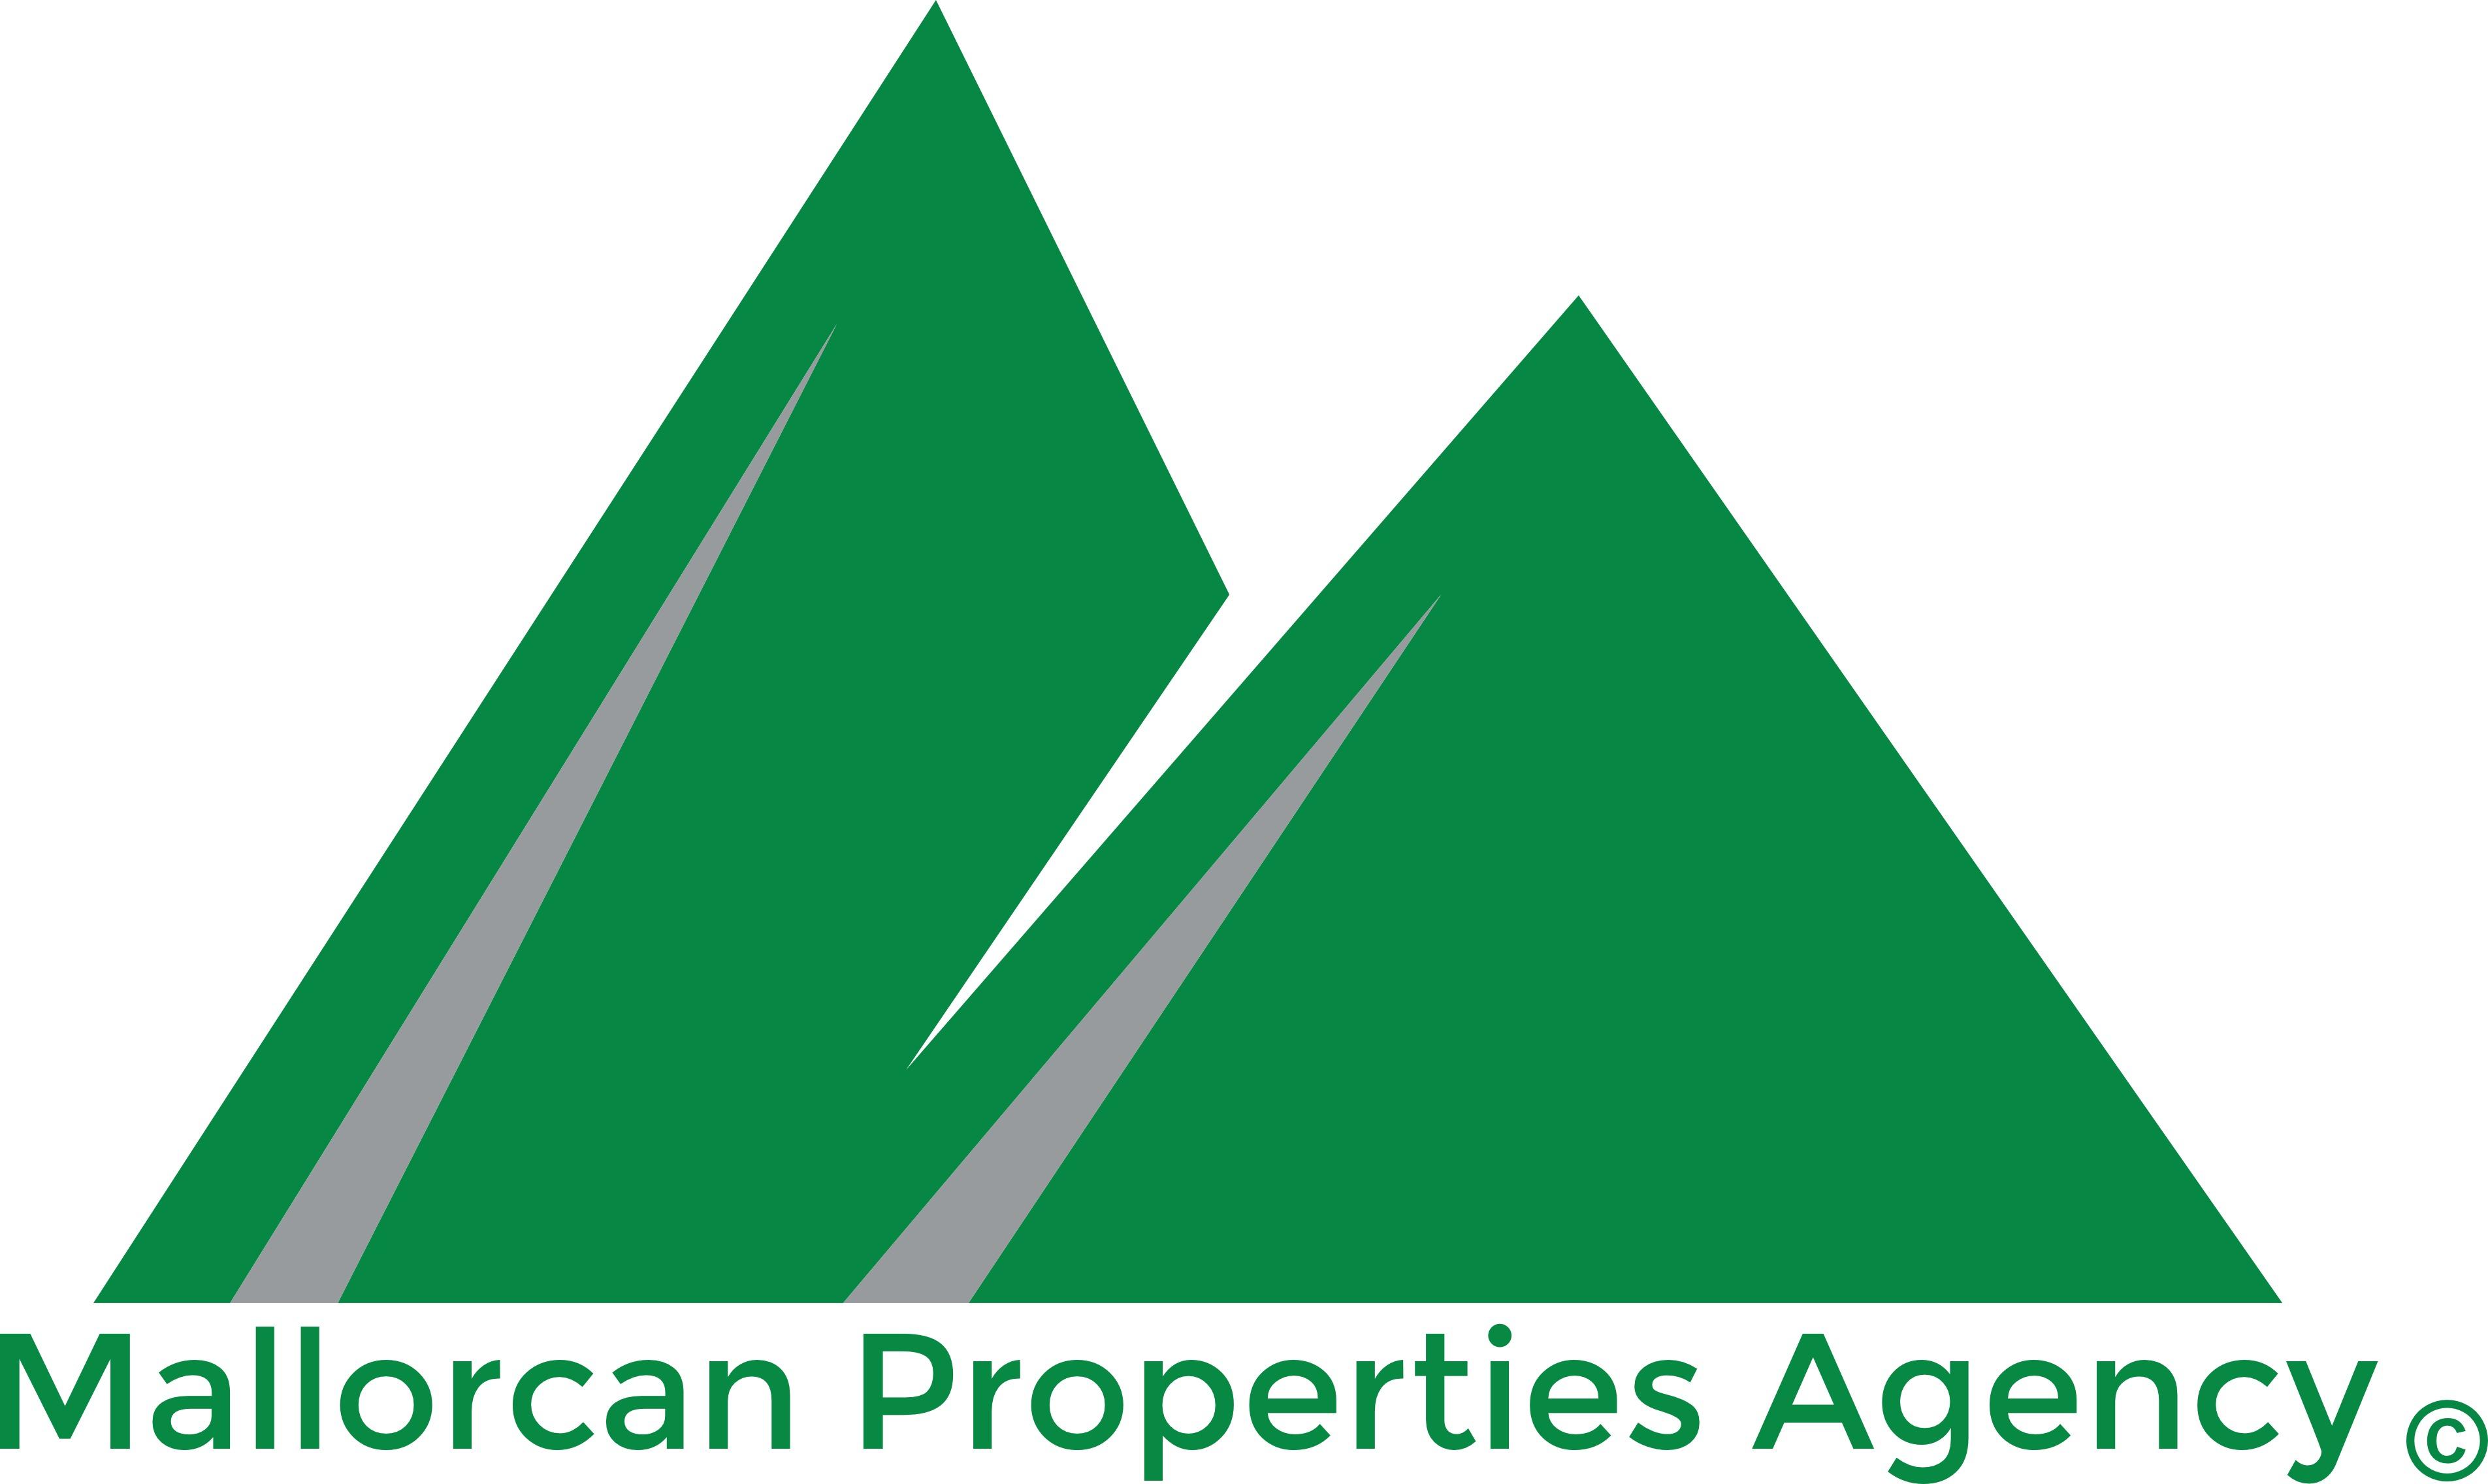 MALLORCAN PROPERTIES AGENCY logo